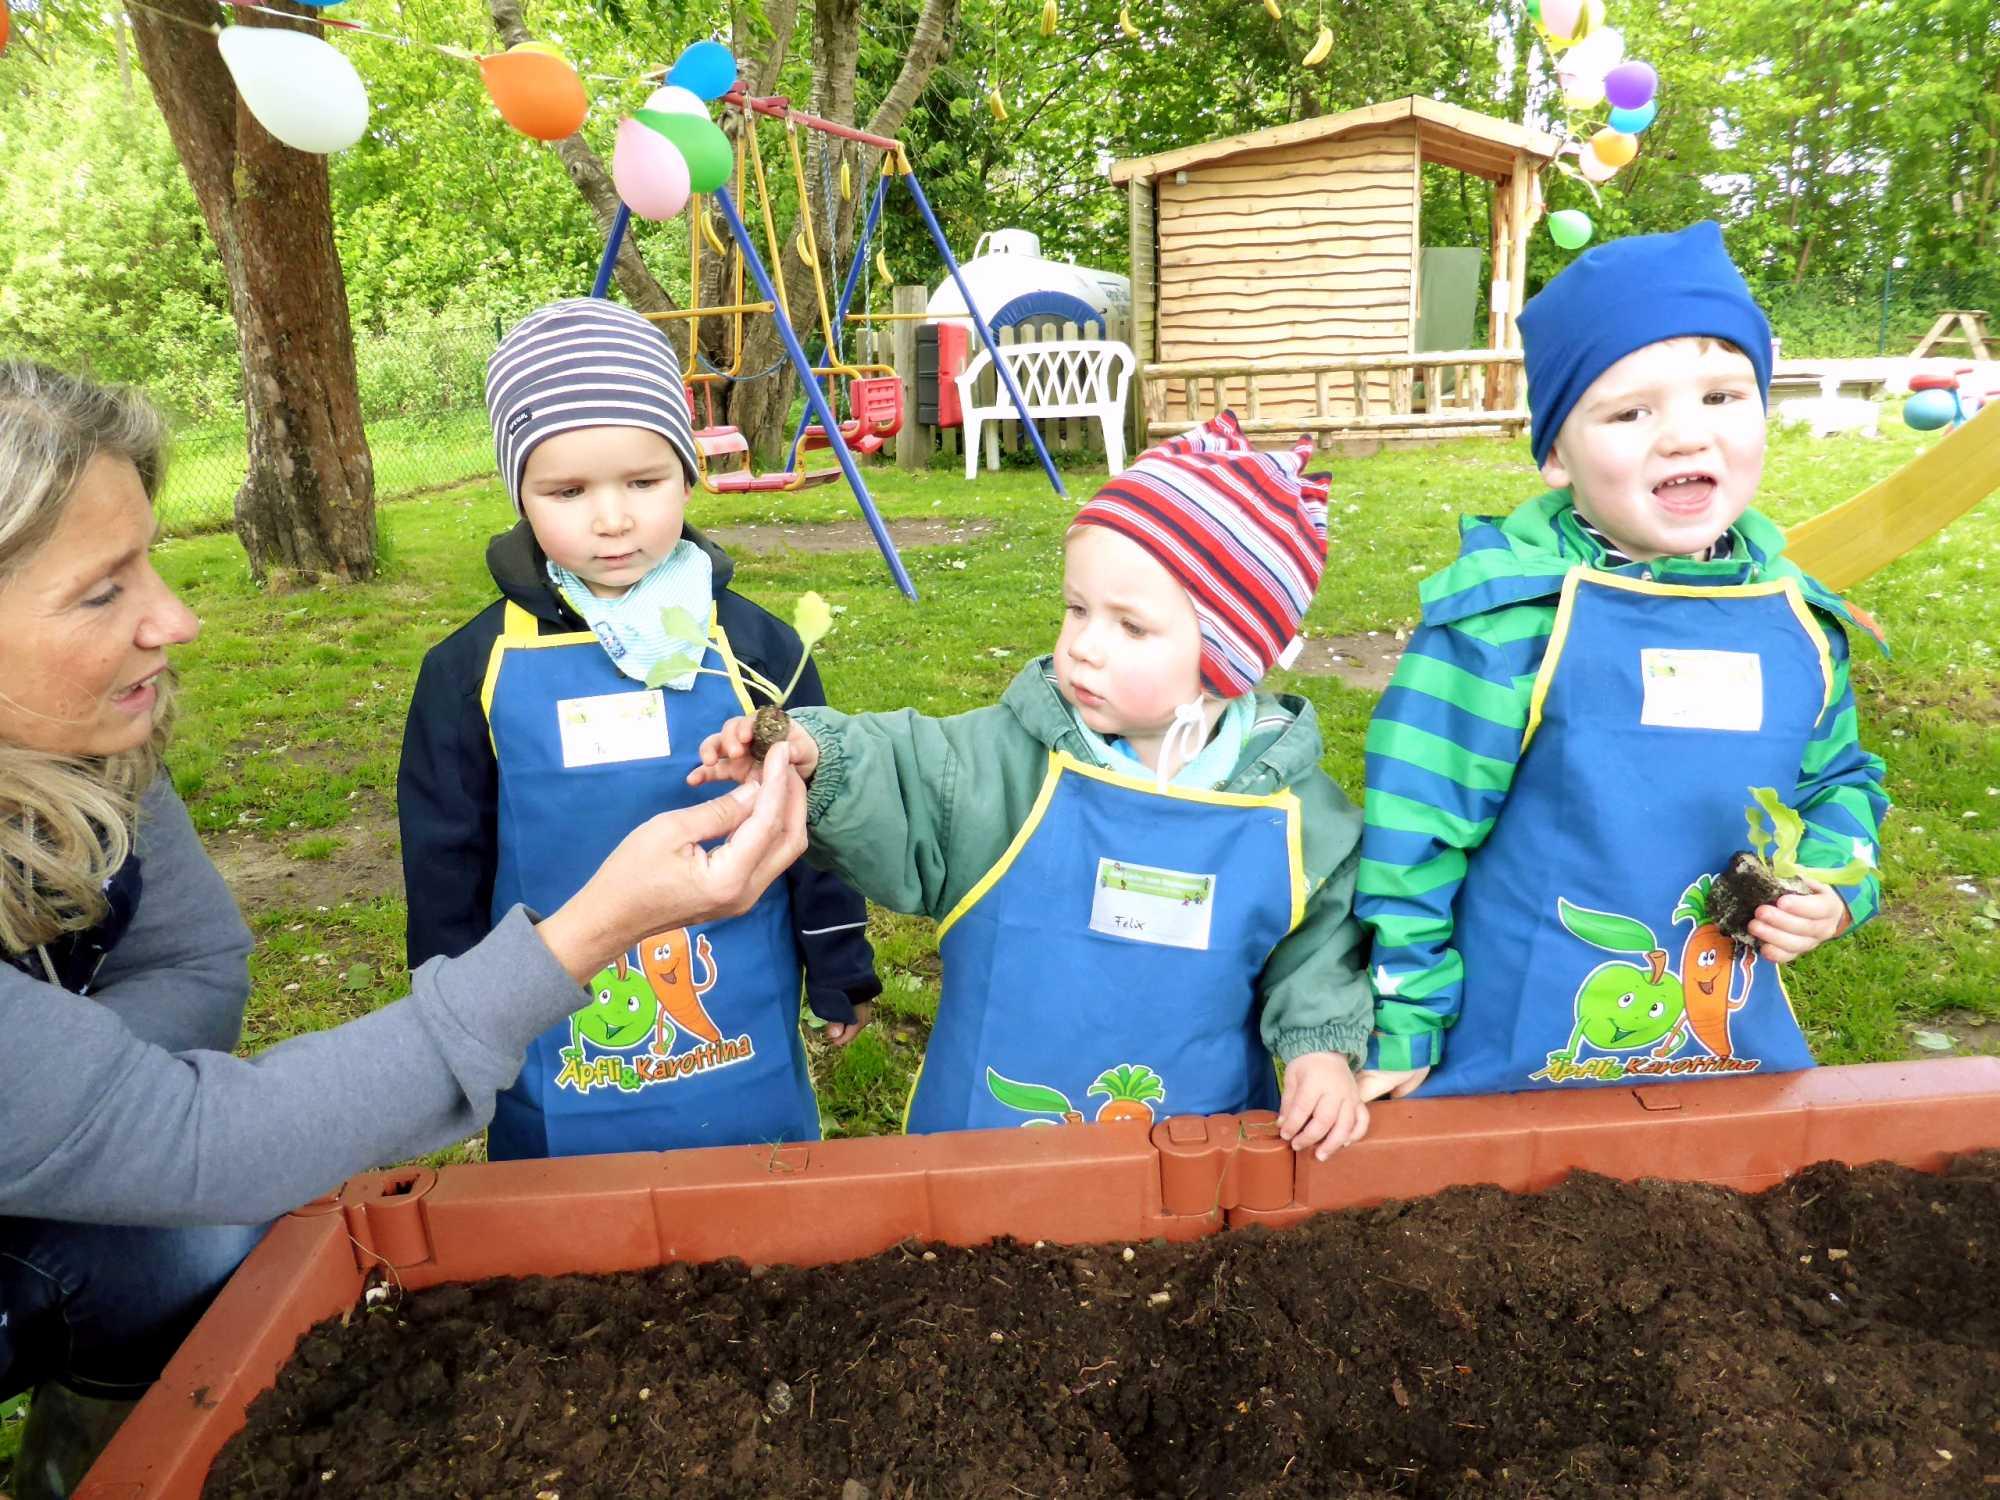 Gemüsebeet Kid Zone Kinderbetreuung 4 - Kita Kid Zone Kinderbetreuung für 0-3 Jahre in Jersbek